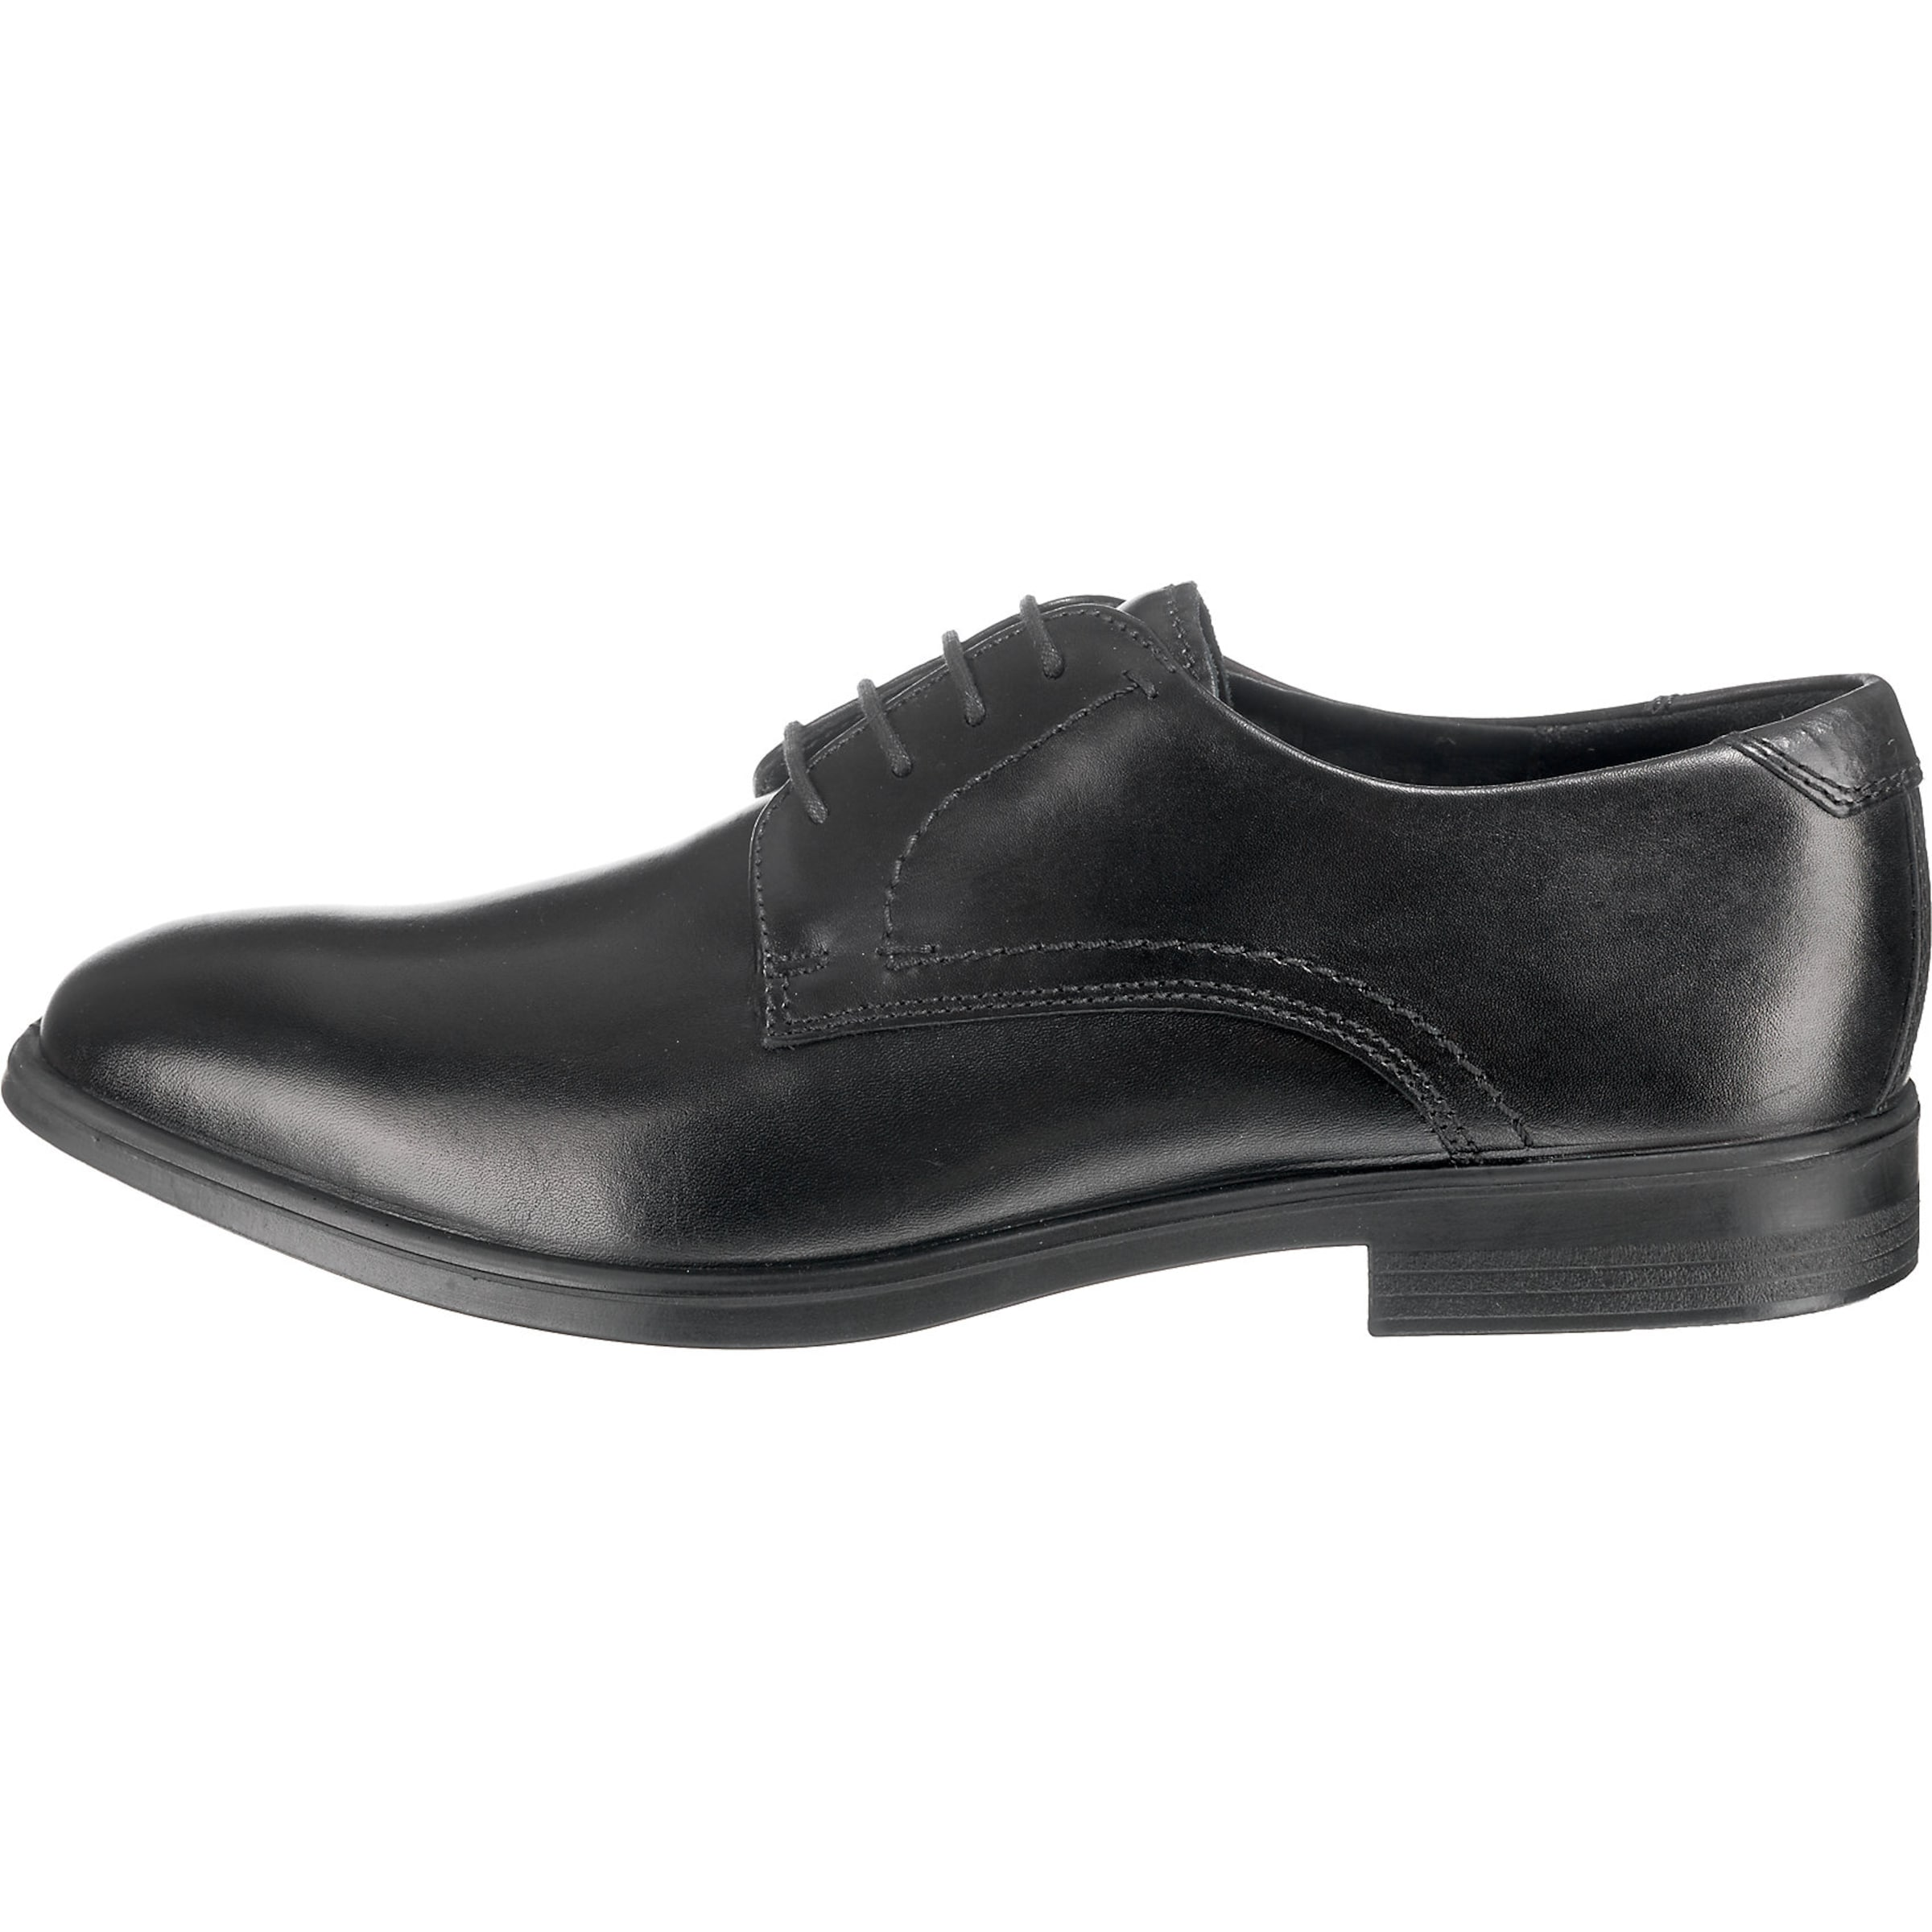 Schuhe Schuhe 'melbourne' In 'melbourne' Ecco Schwarz In Ecco Ecco Schwarz 6yYgbf7